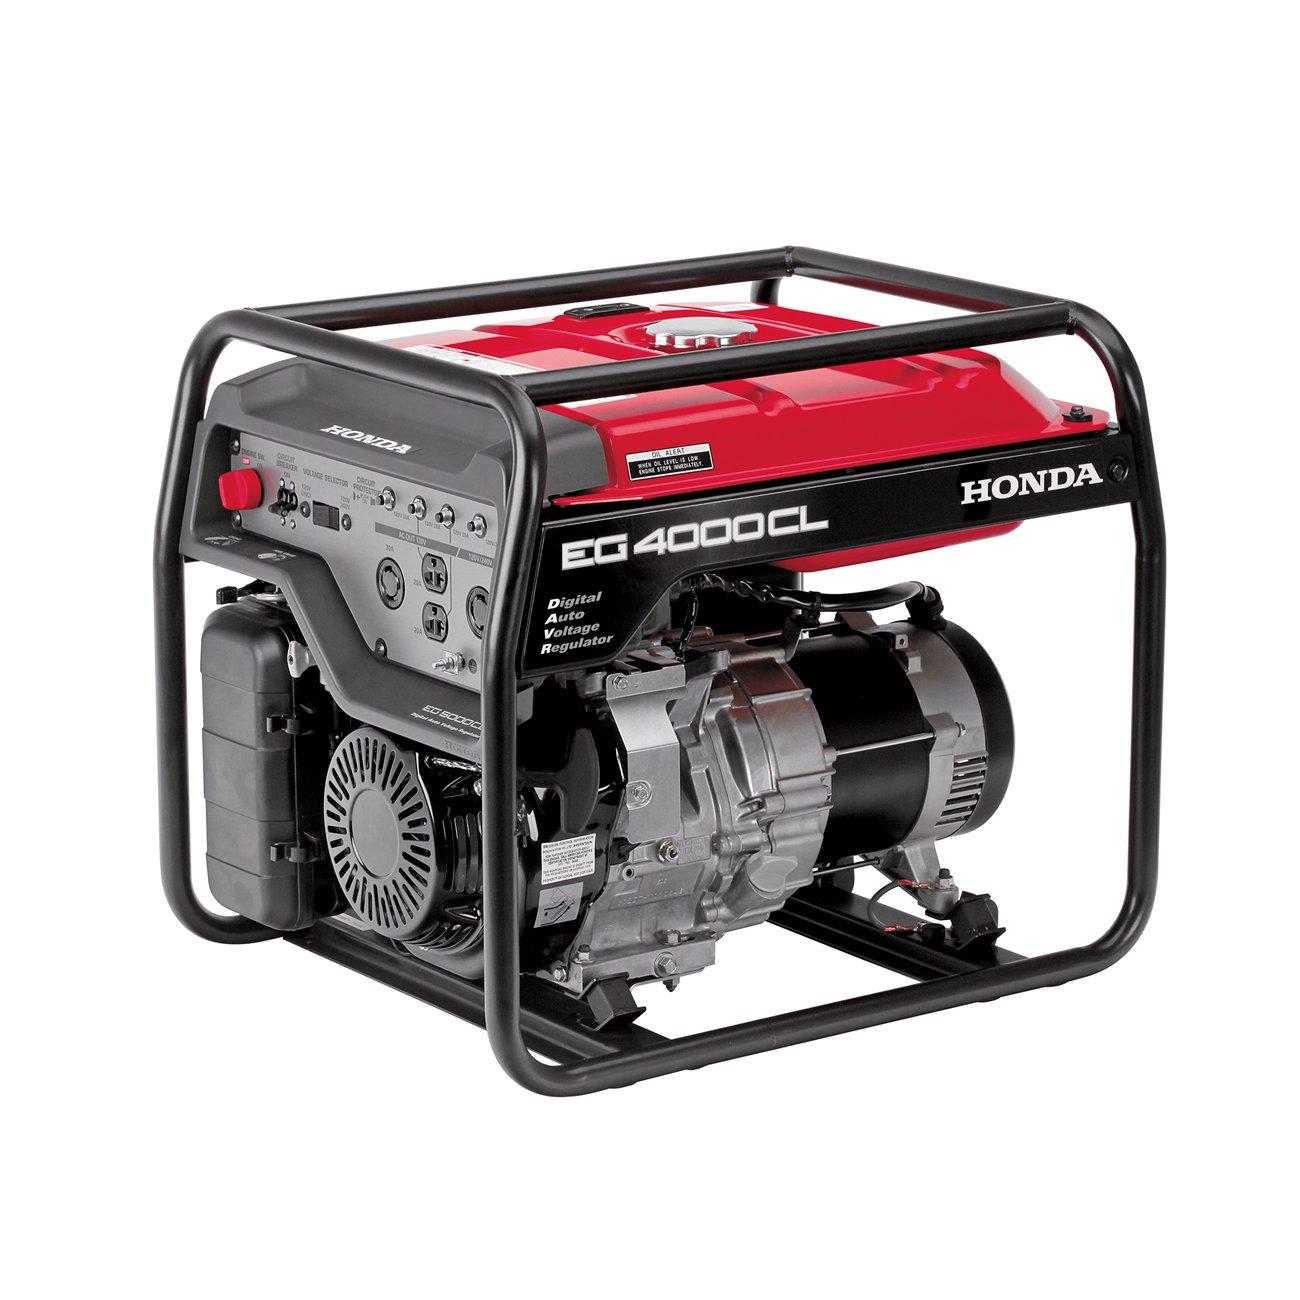 Honda 4, 000 Watt Gas Powered Home RV Portable Generator EG4000